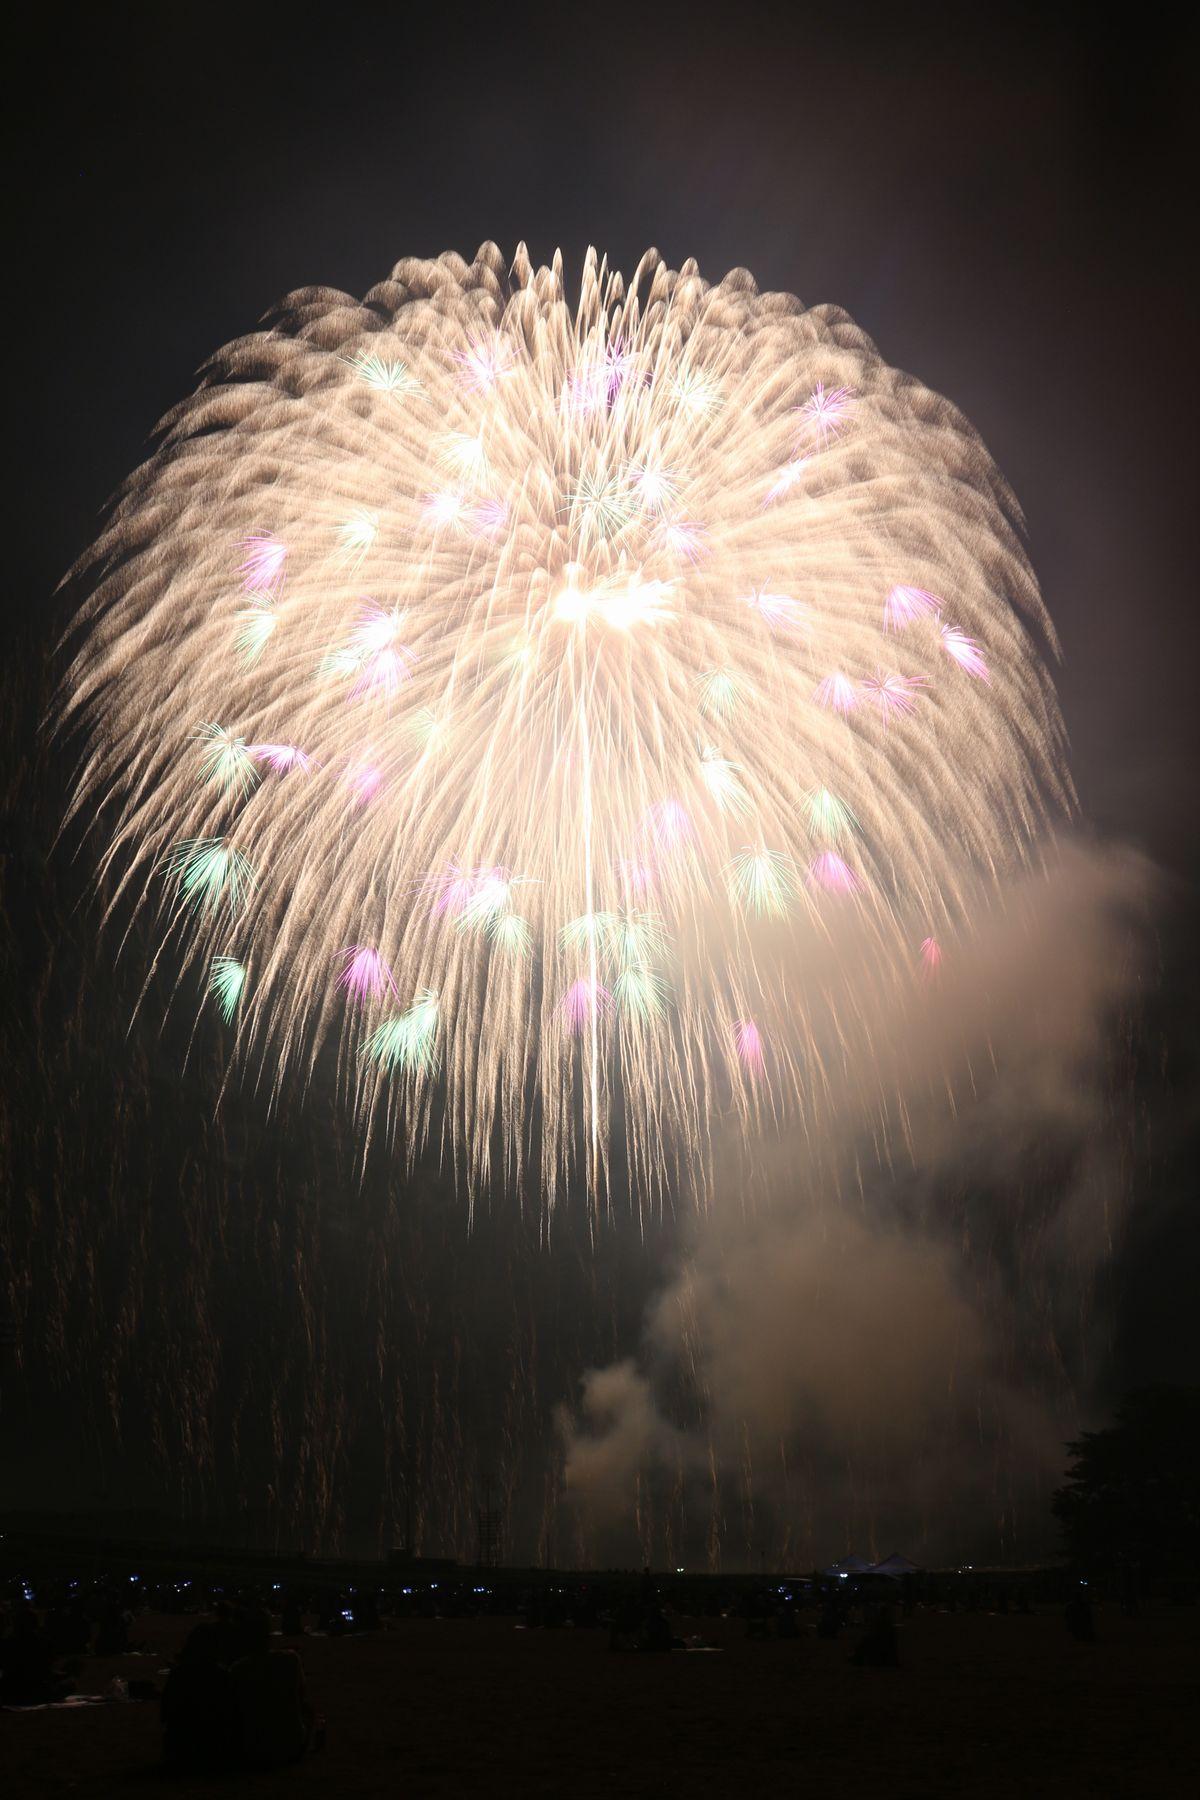 http://www.town.asakawa.fukushima.jp/blog-files/hanabi%20%2830%29.JPG